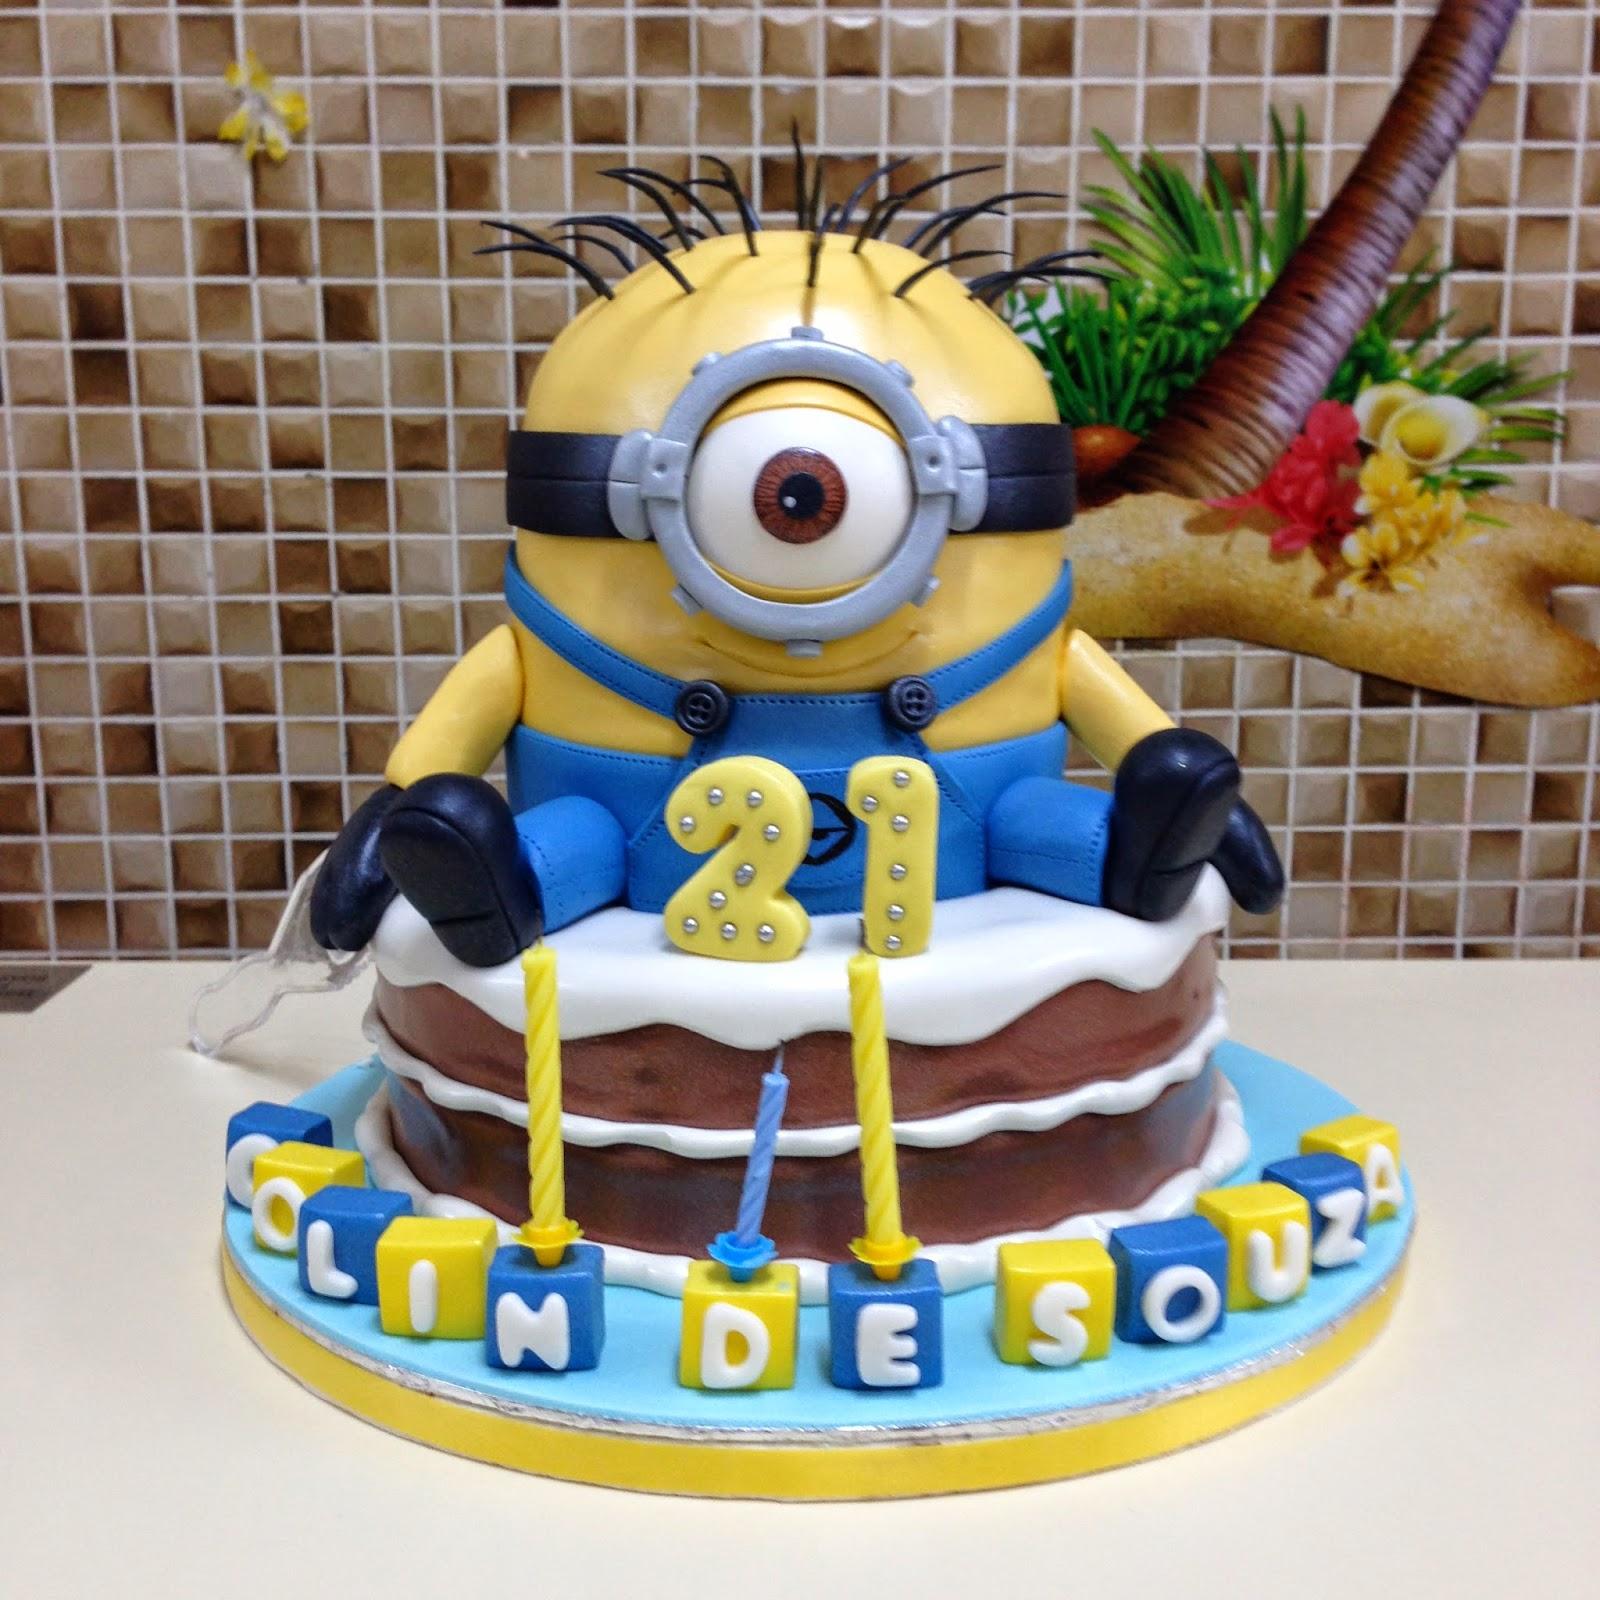 The Sensational Cakes MINIONS 3D CAKE SINGAPORE OVER